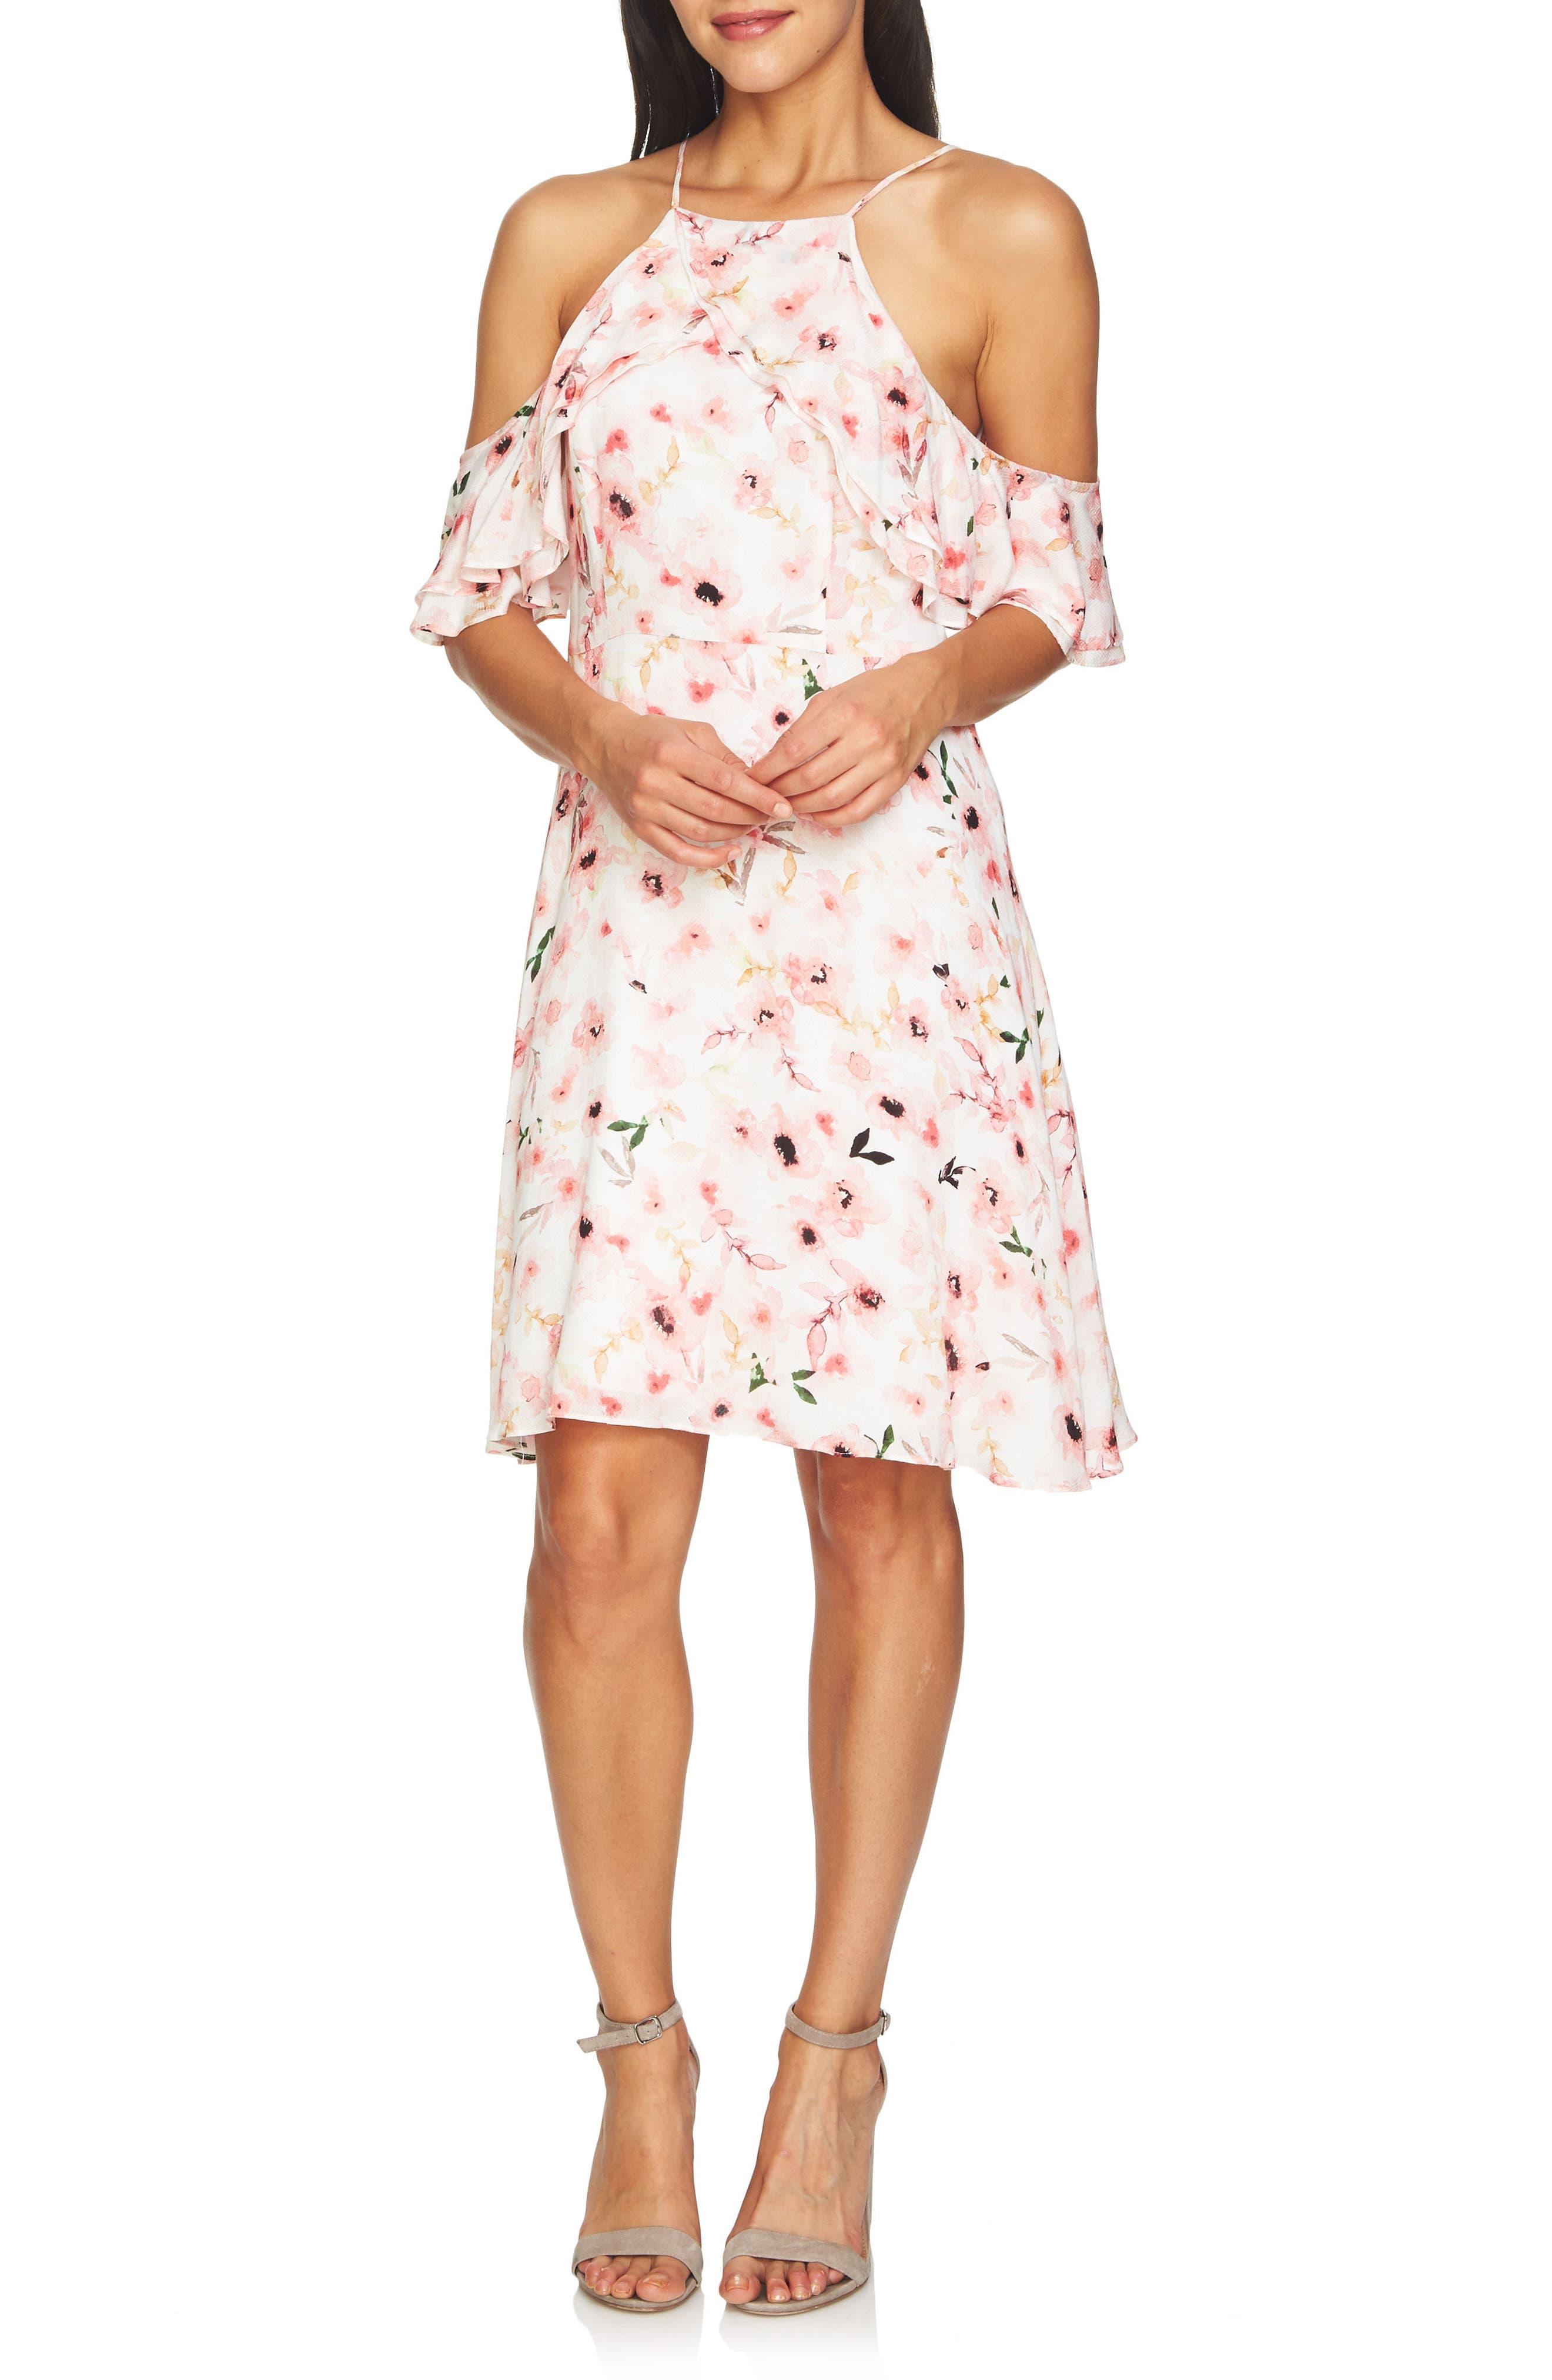 Arden Cold Shoulder Ruffle Dress,                             Main thumbnail 1, color,                             145